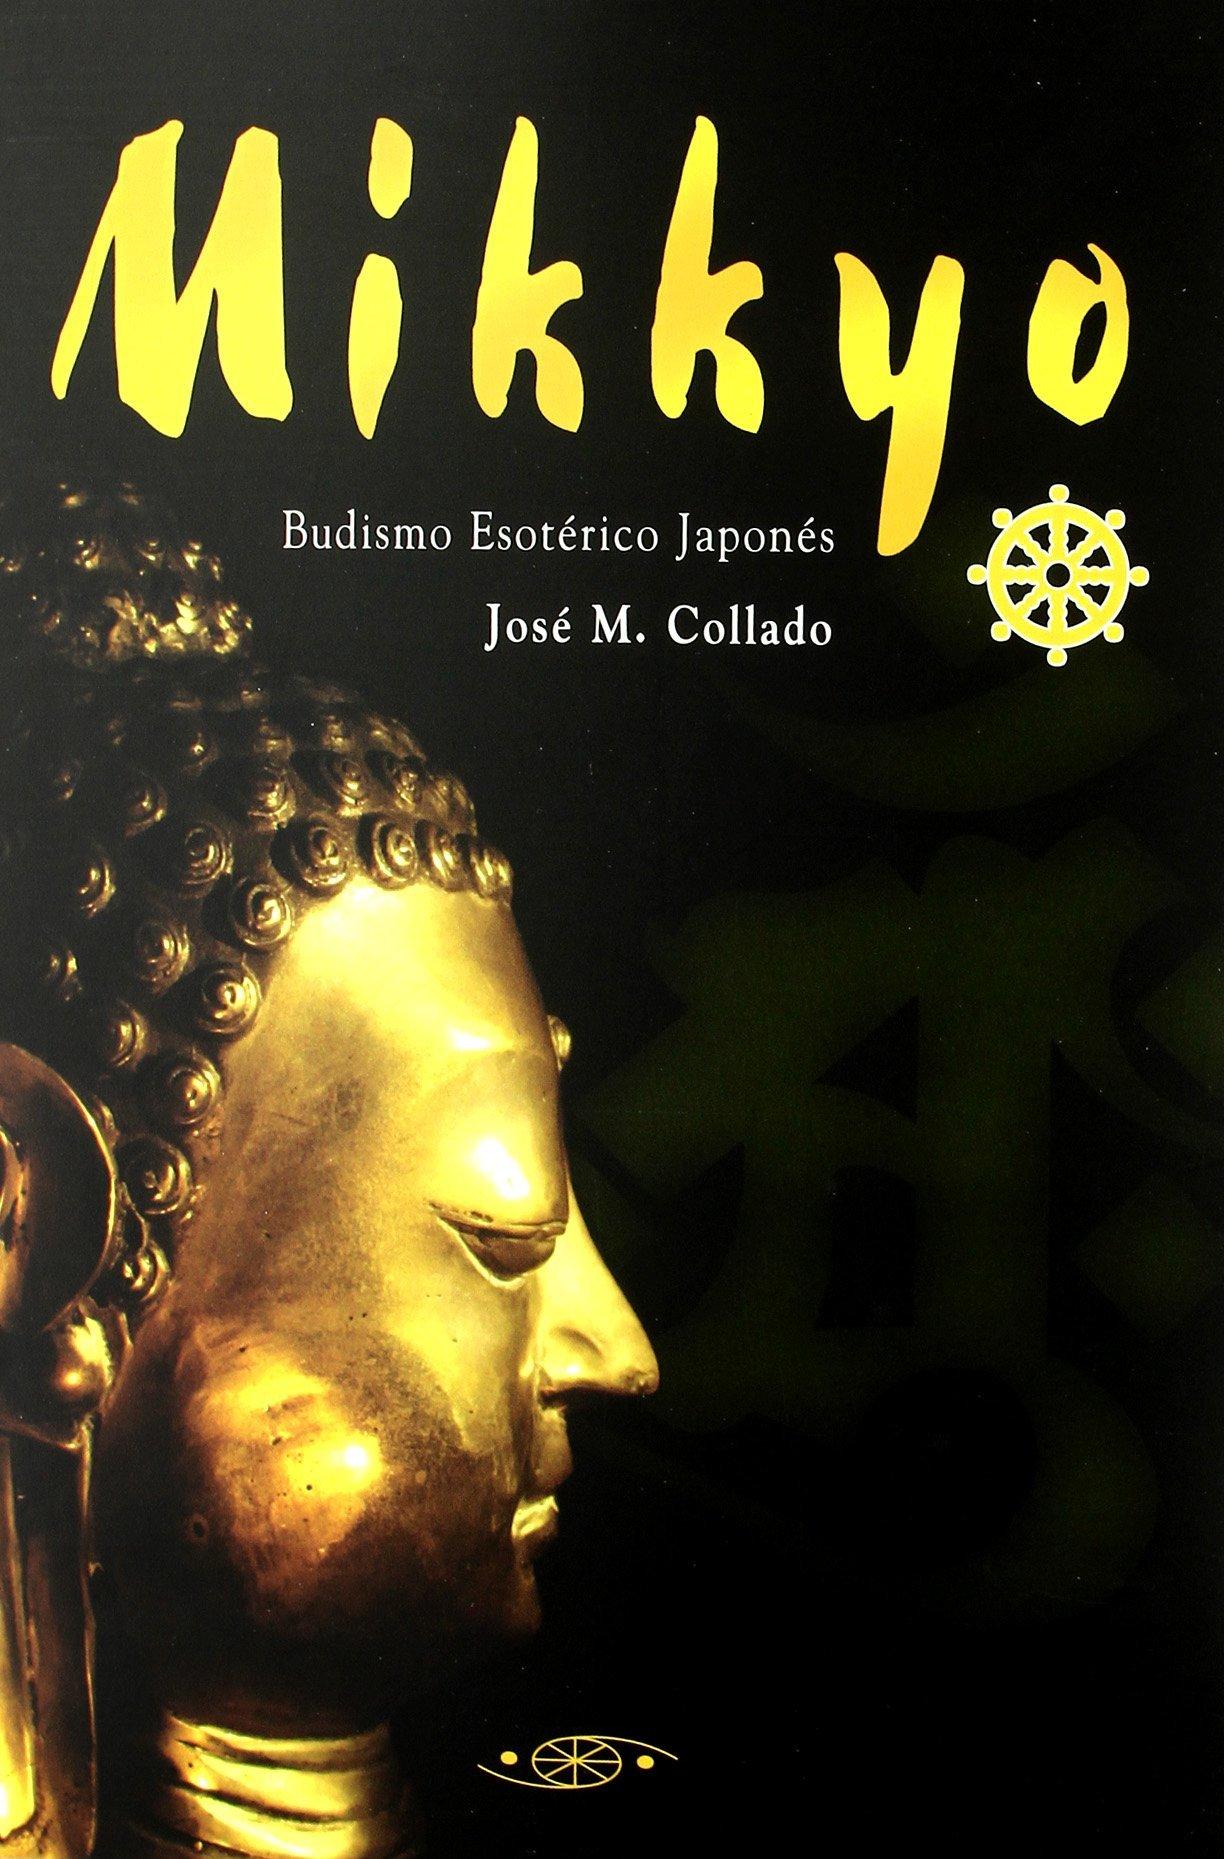 Mikkyo budismo esotérico japonés